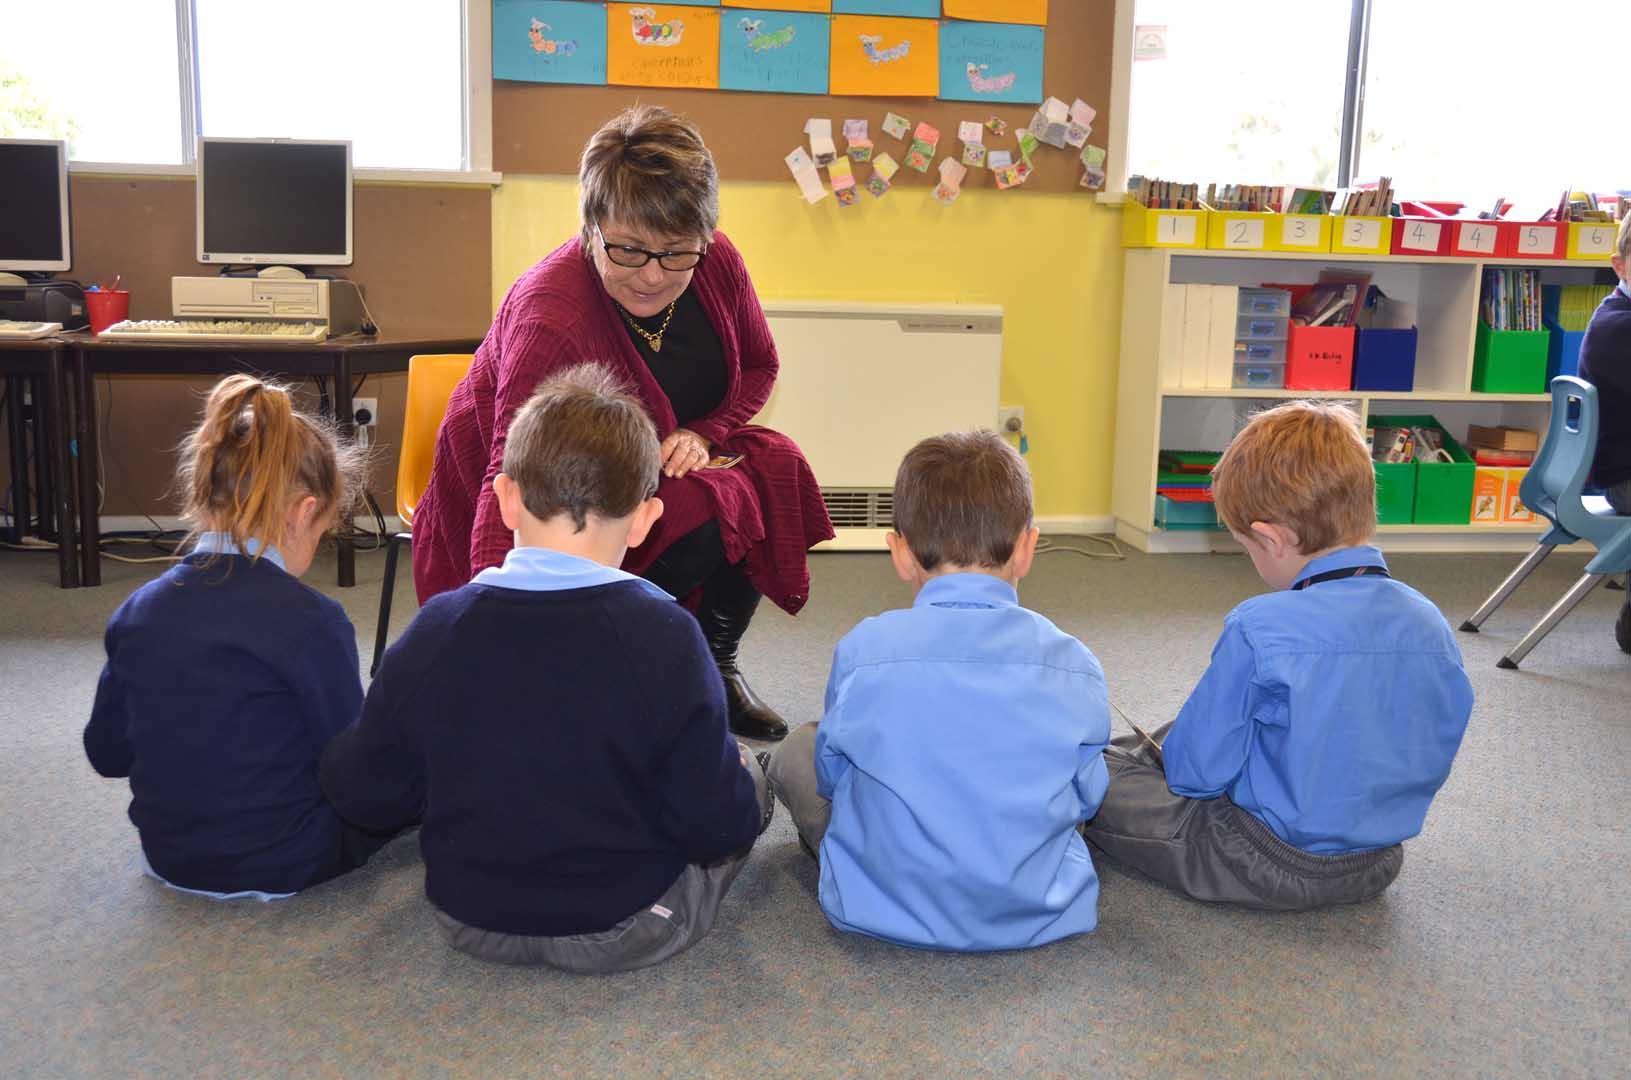 St-Patricks-walcha-classroom3462